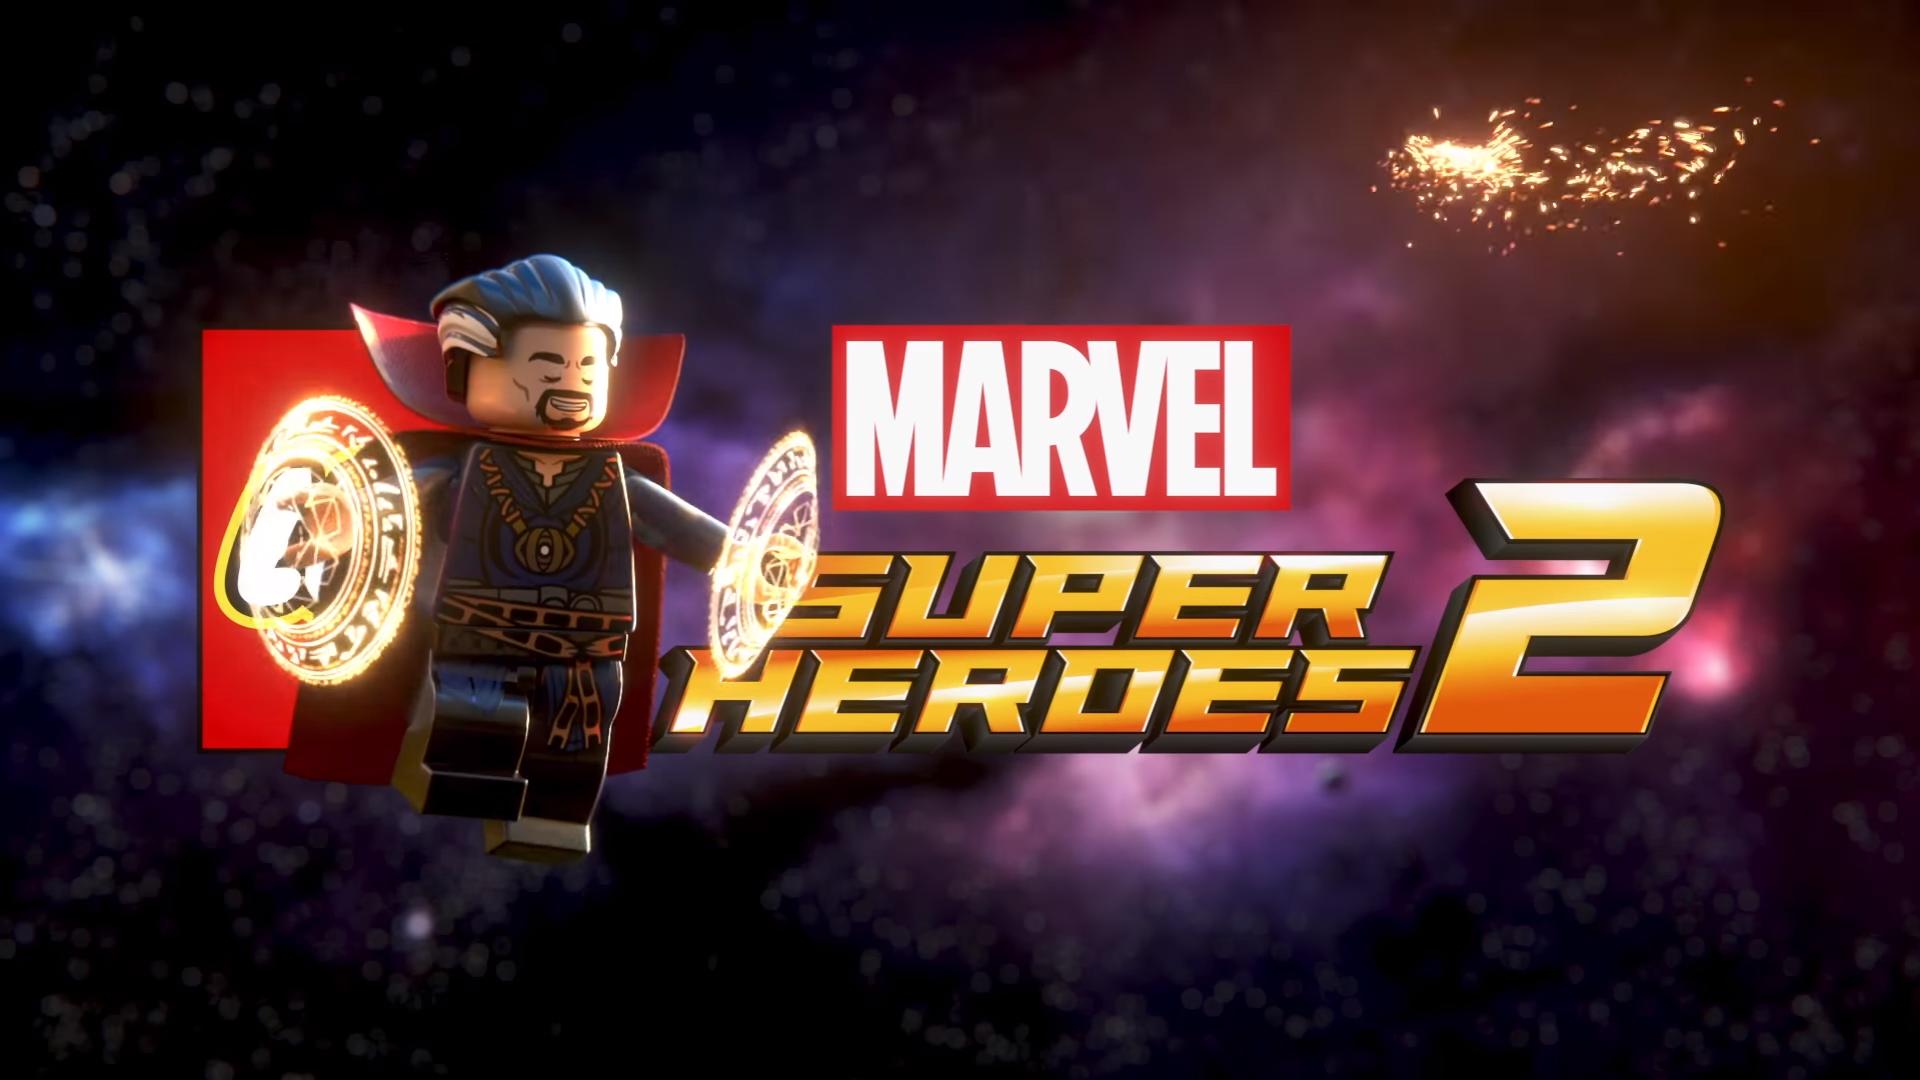 lego marvel heroes wallpaper - photo #23